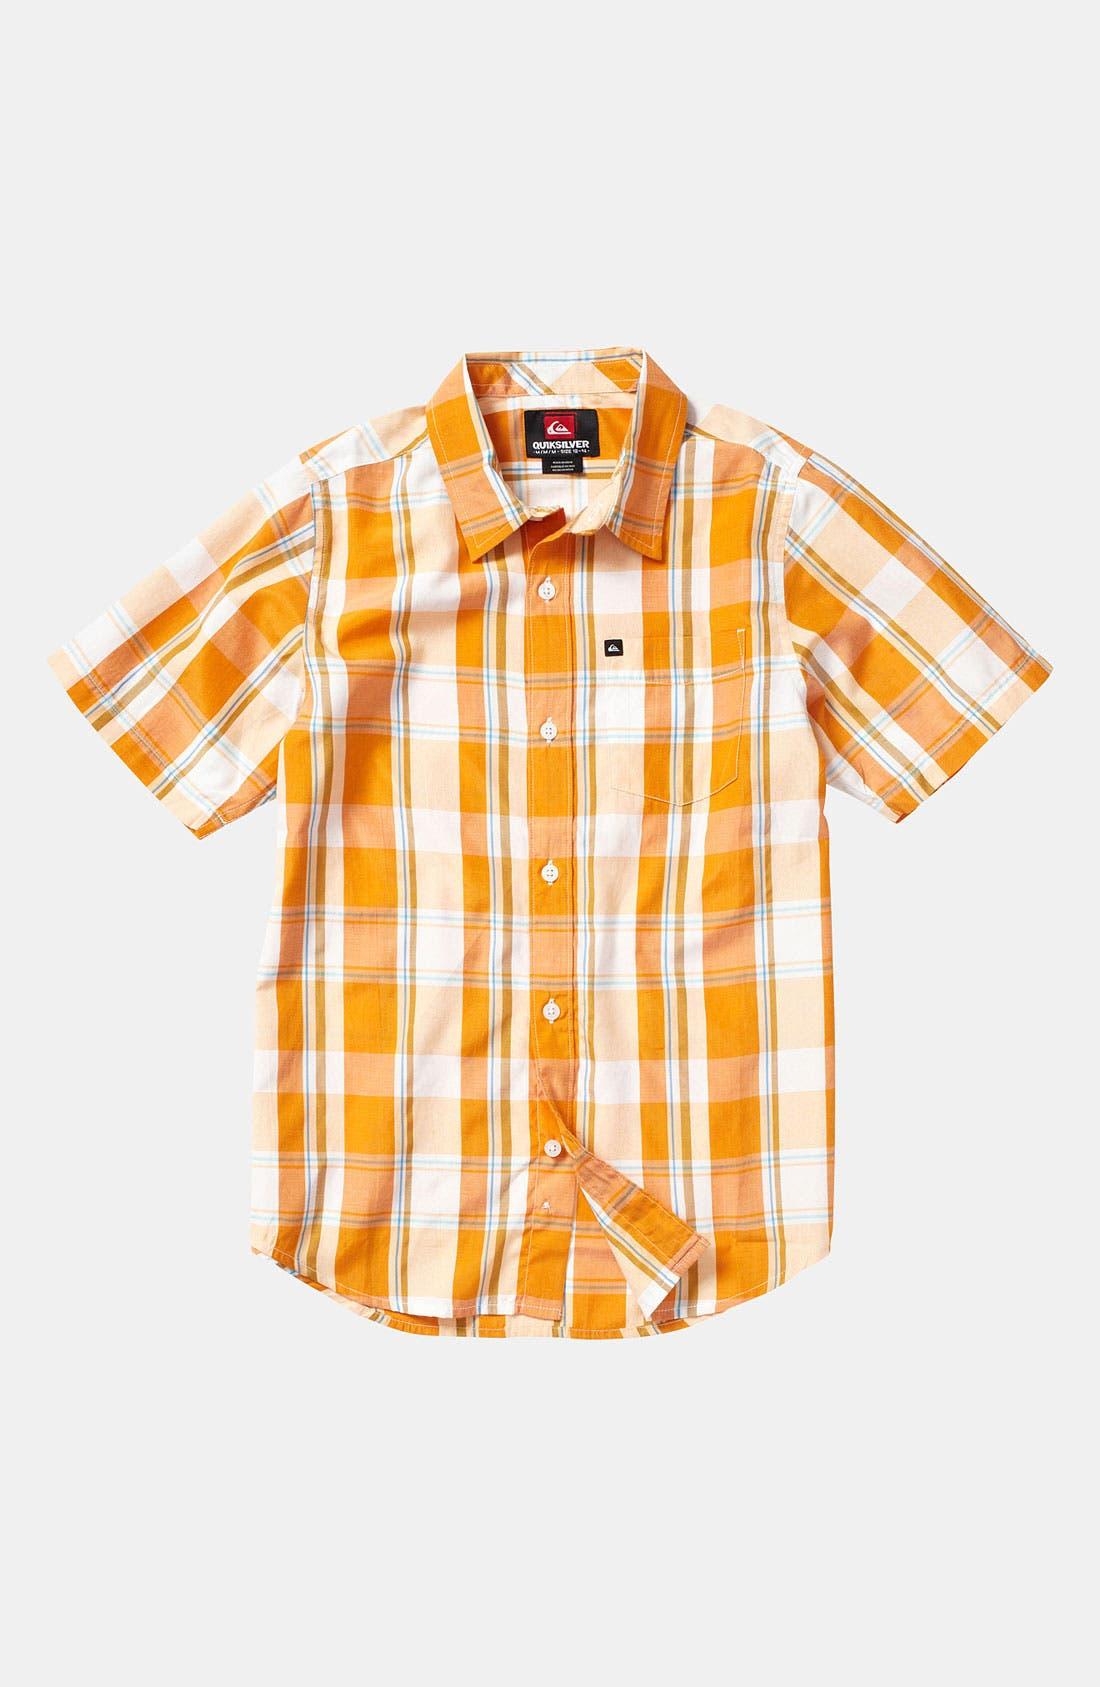 Alternate Image 1 Selected - Quiksilver 'El Pat' Woven Shirt (Big Boys)